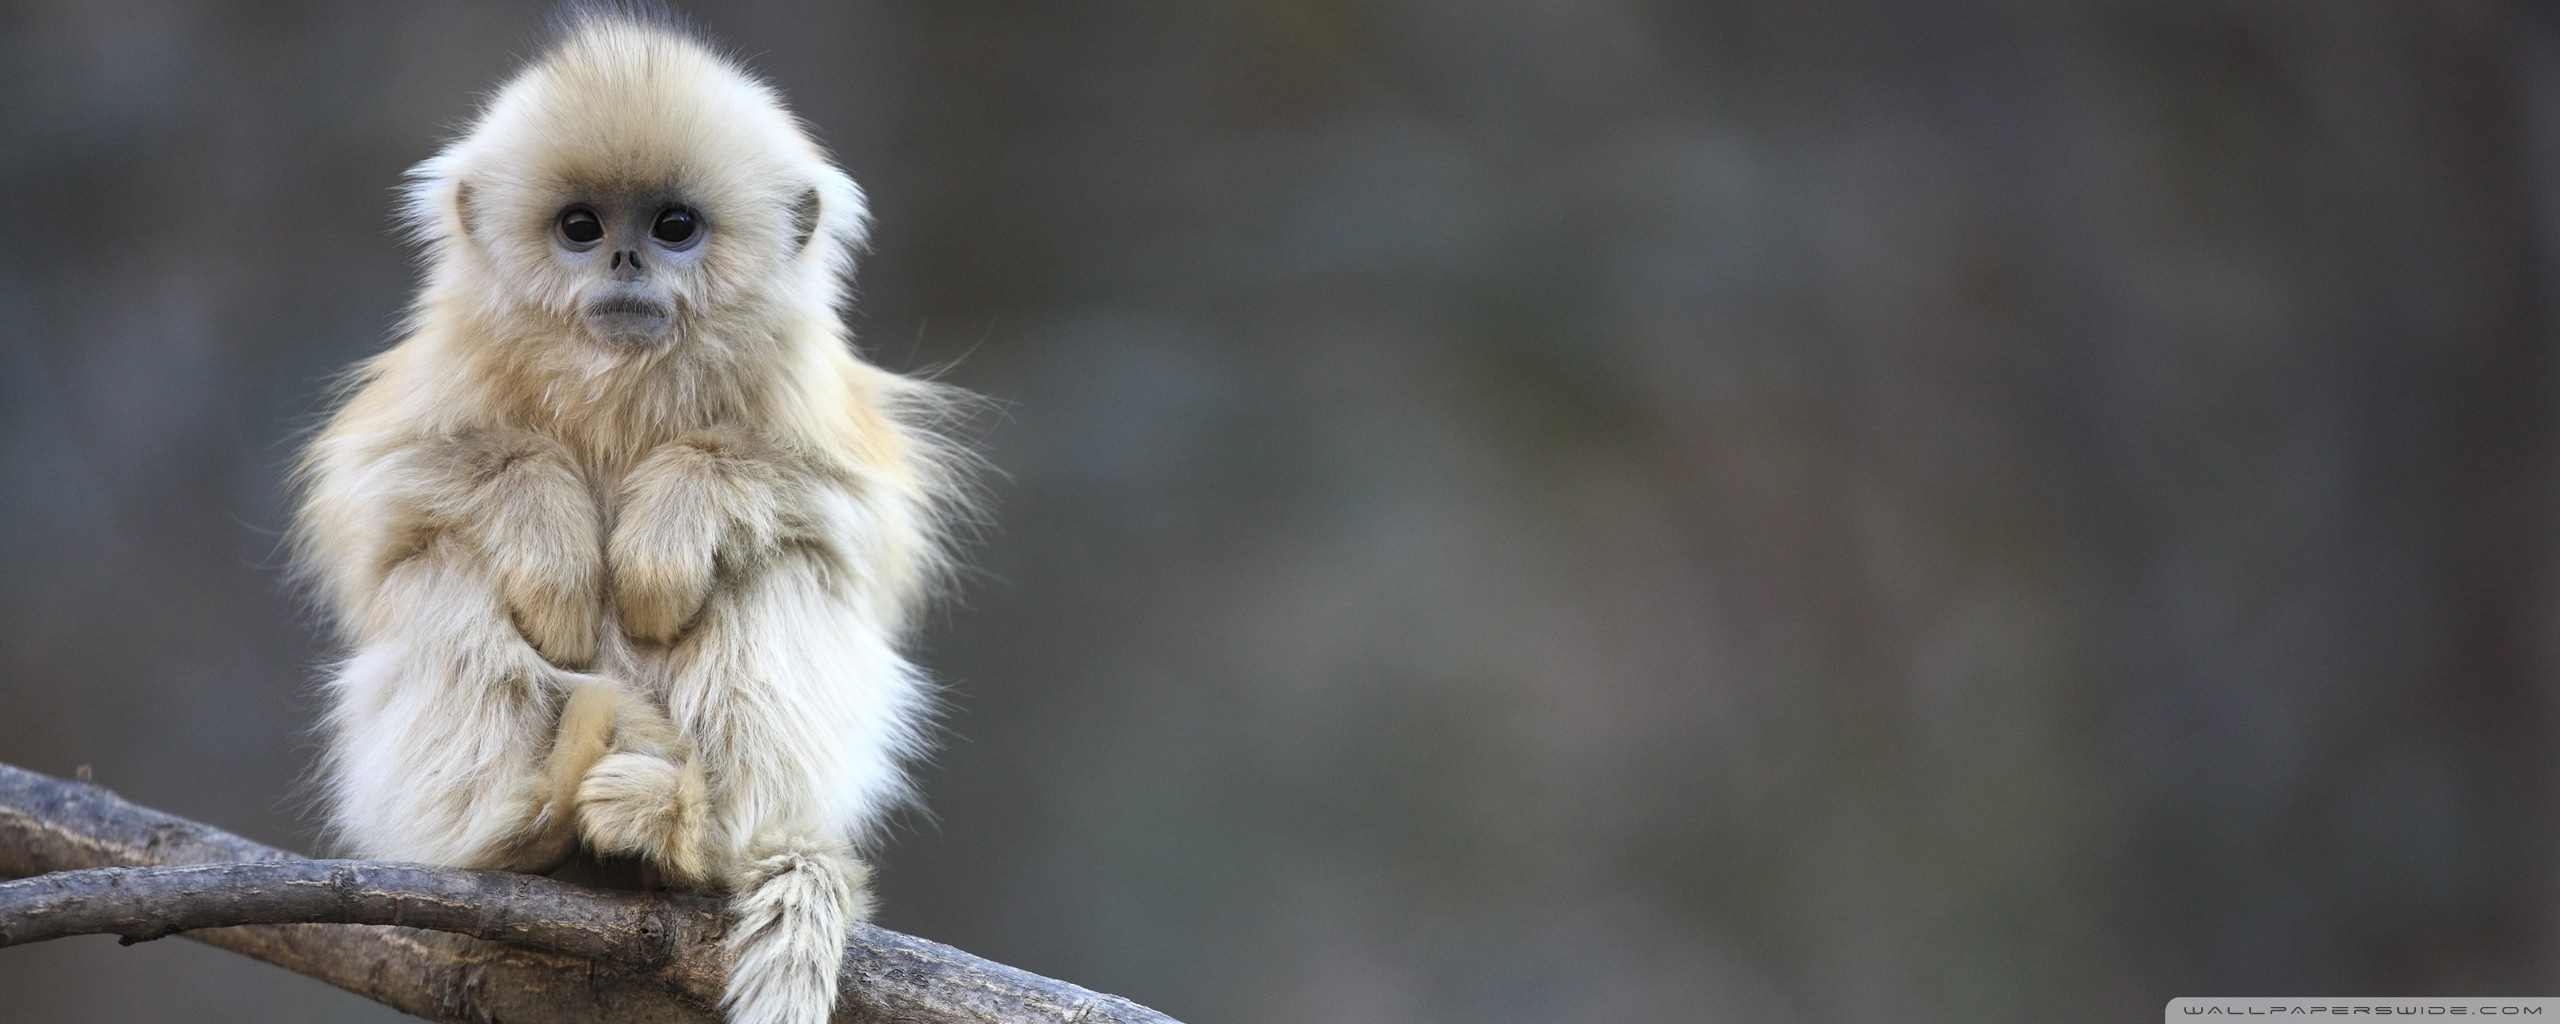 White Monkey HD desktop wallpaper : High Definition : Fullscreen